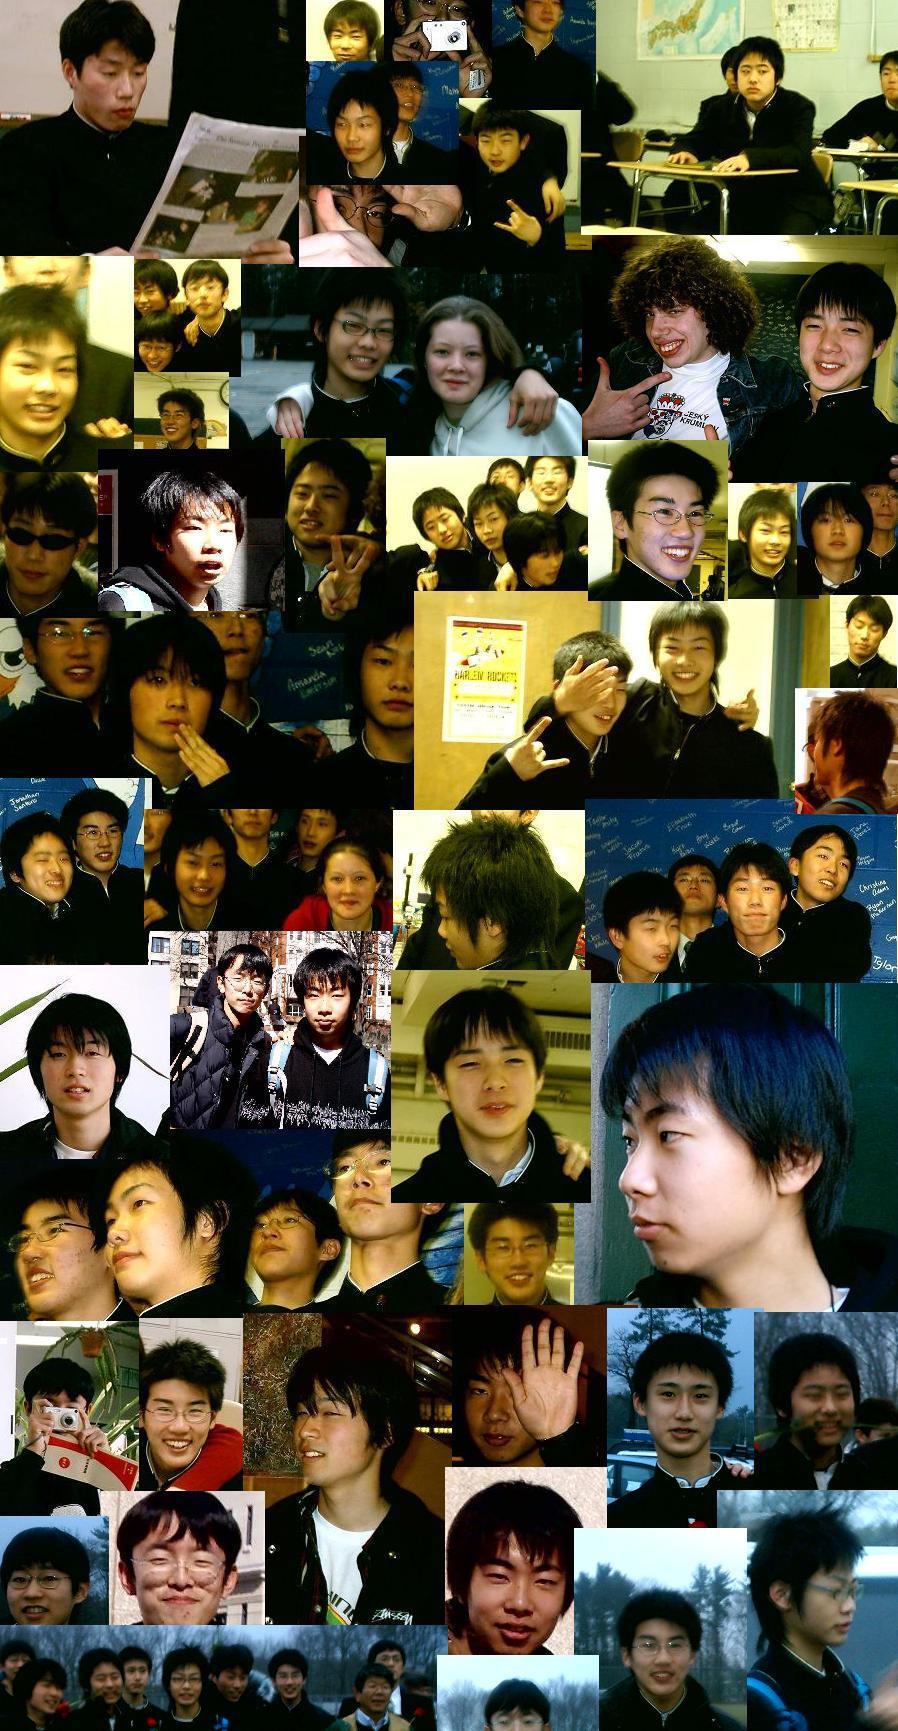 http://fc01.deviantart.com/images3/i/2004/096/c/b/Japanese_people_make_me_happy.jpg